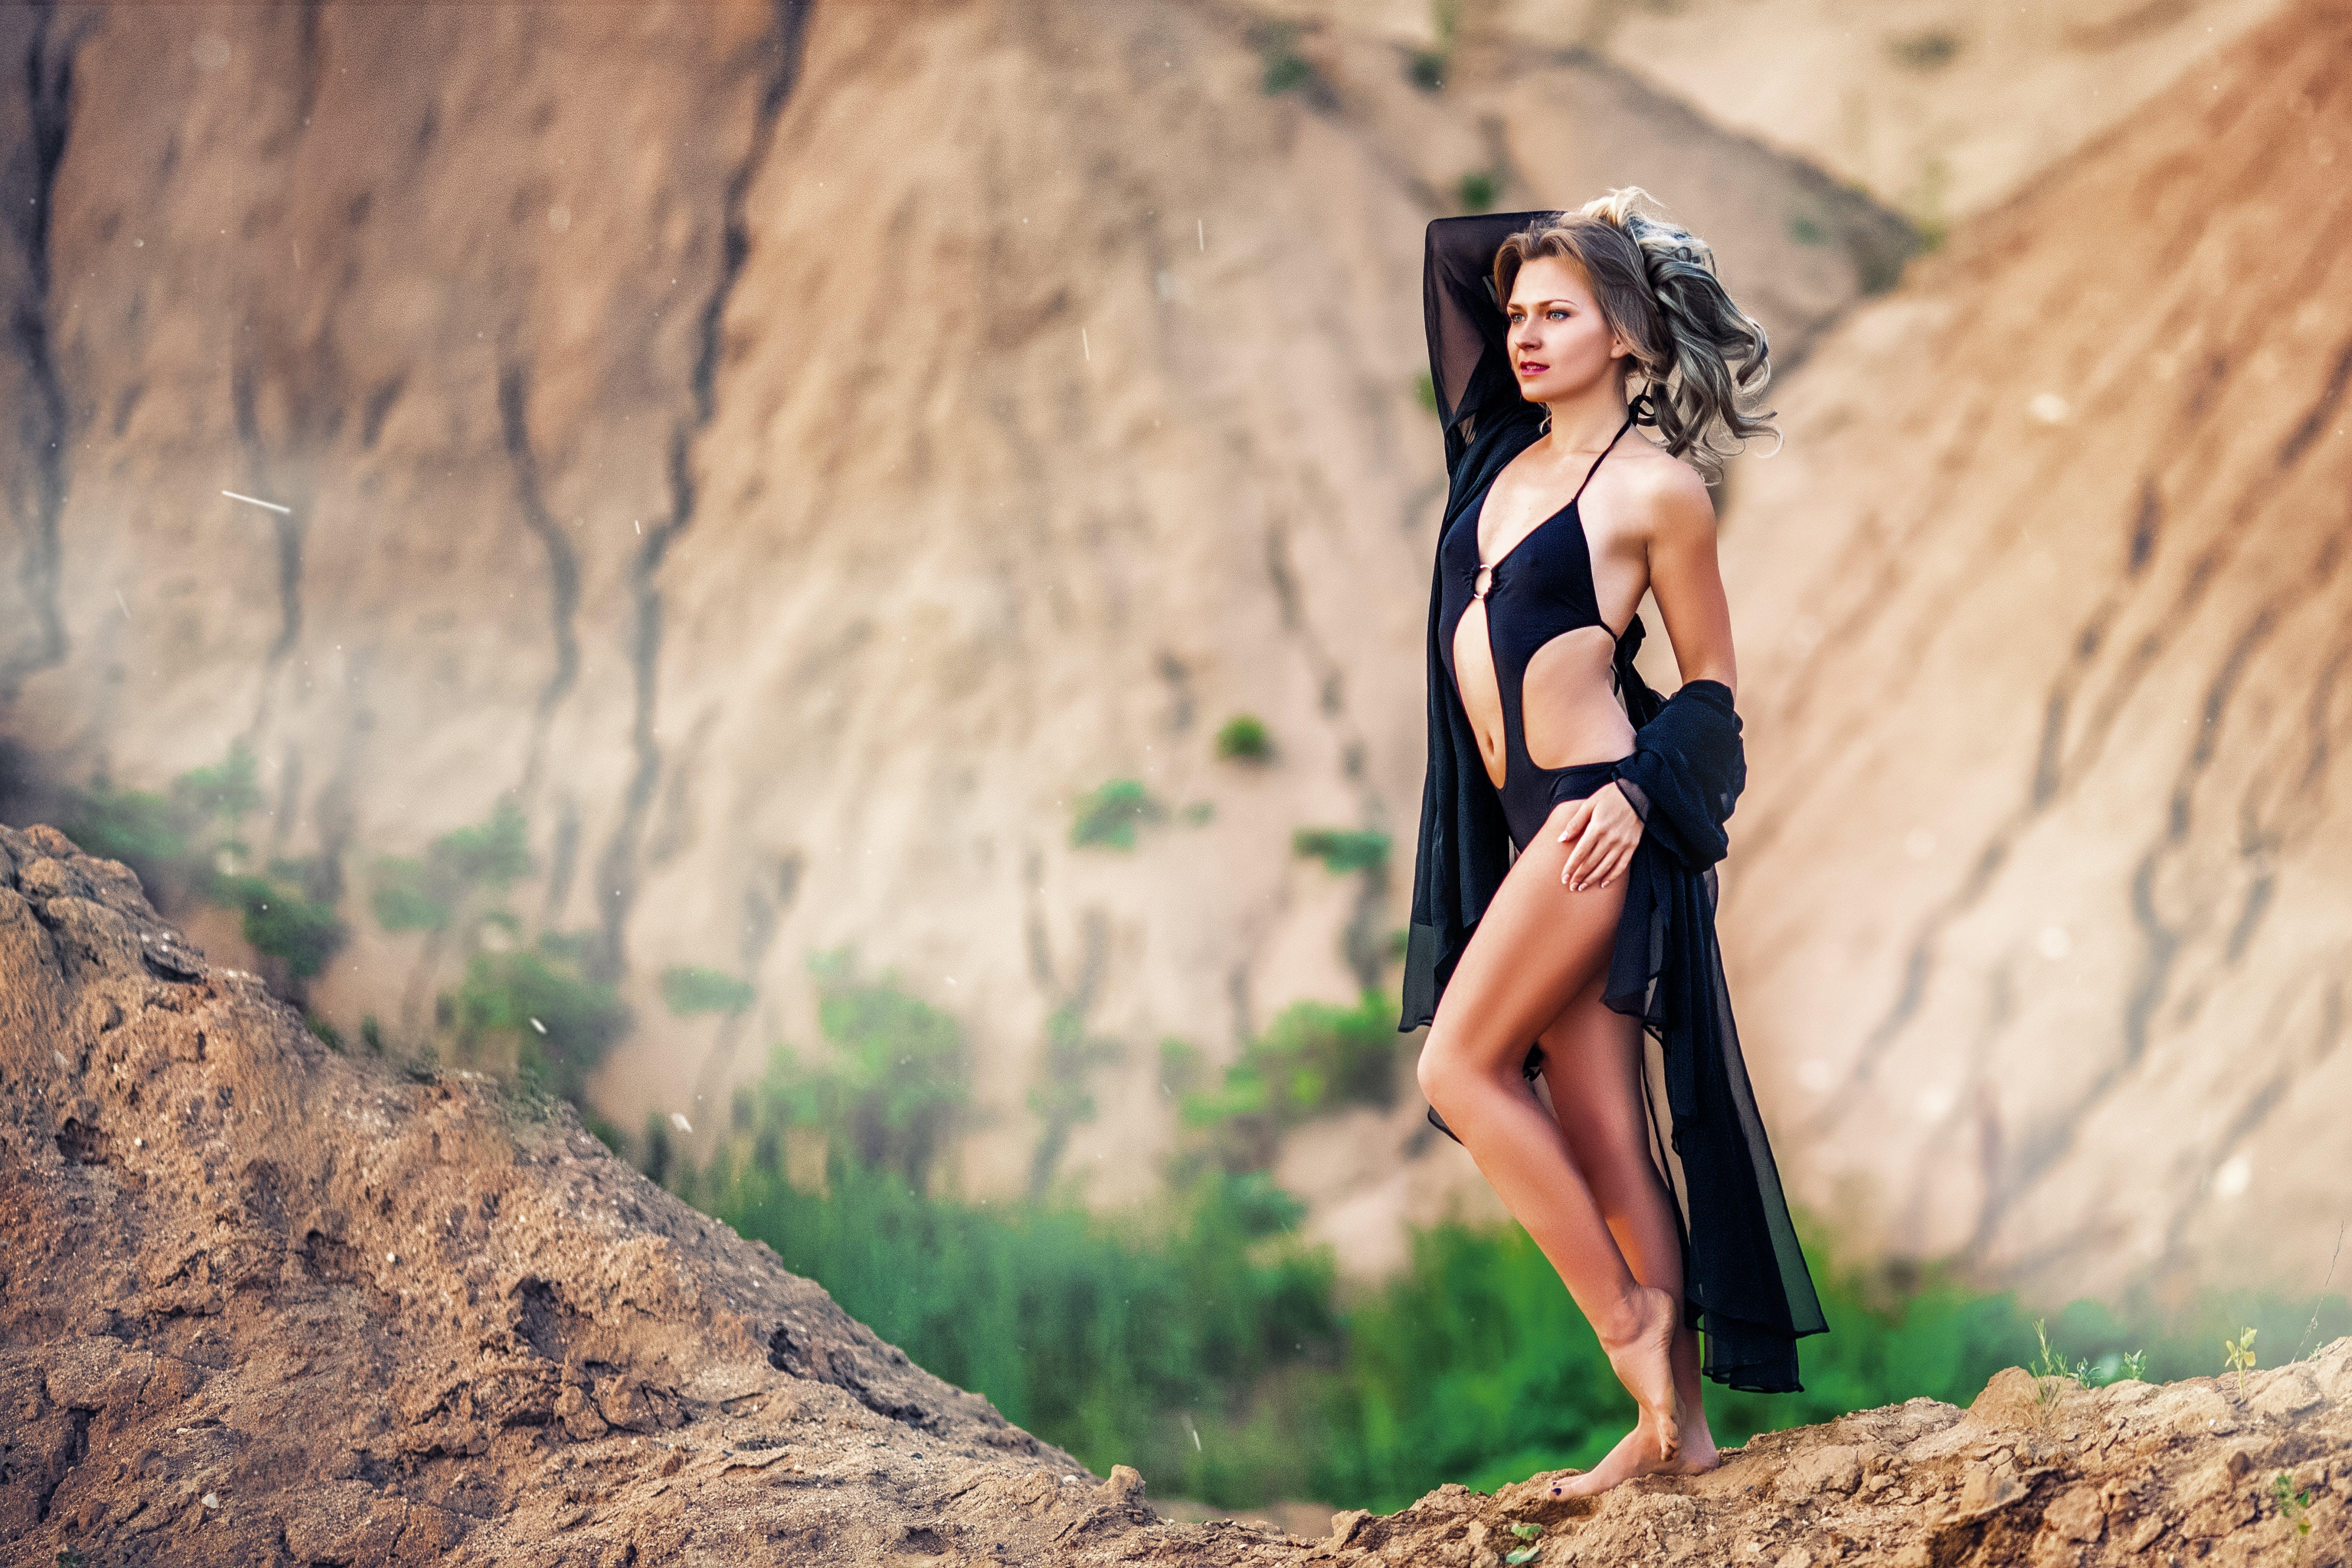 Free stock photo of fashion, person, bikini, woman